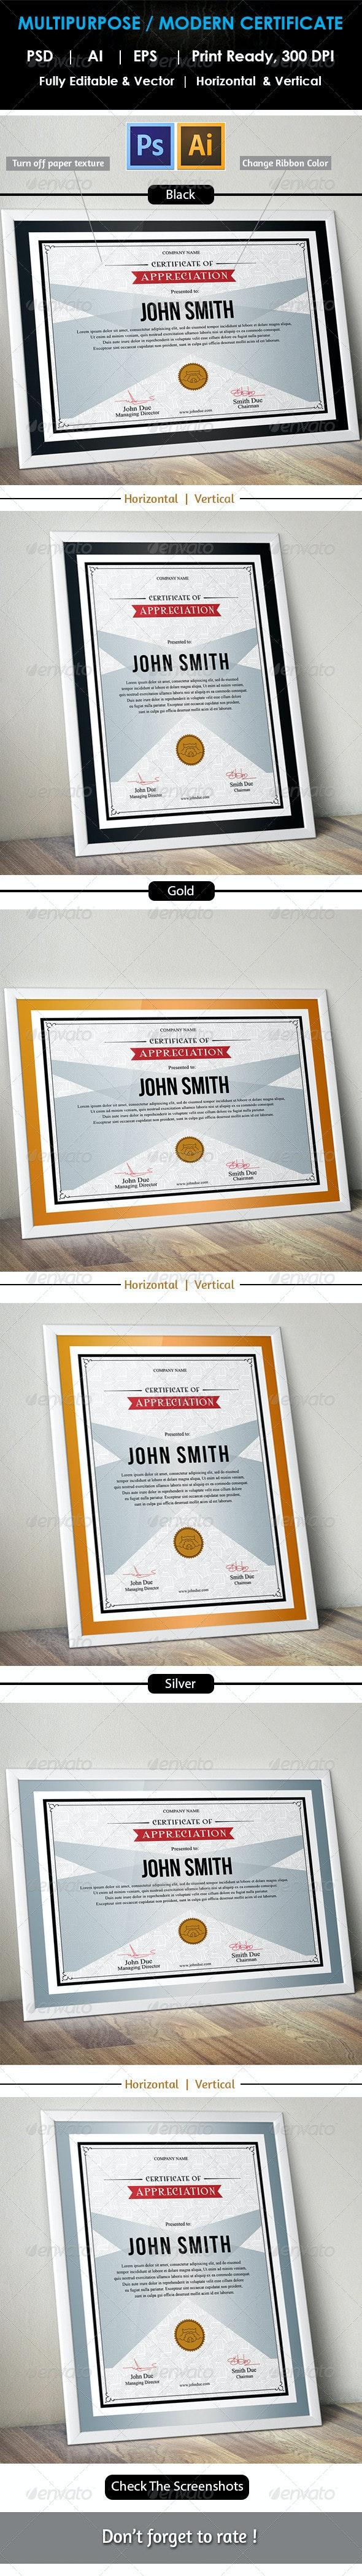 Simple Multipurpose Certificate GD006 - Certificates Stationery